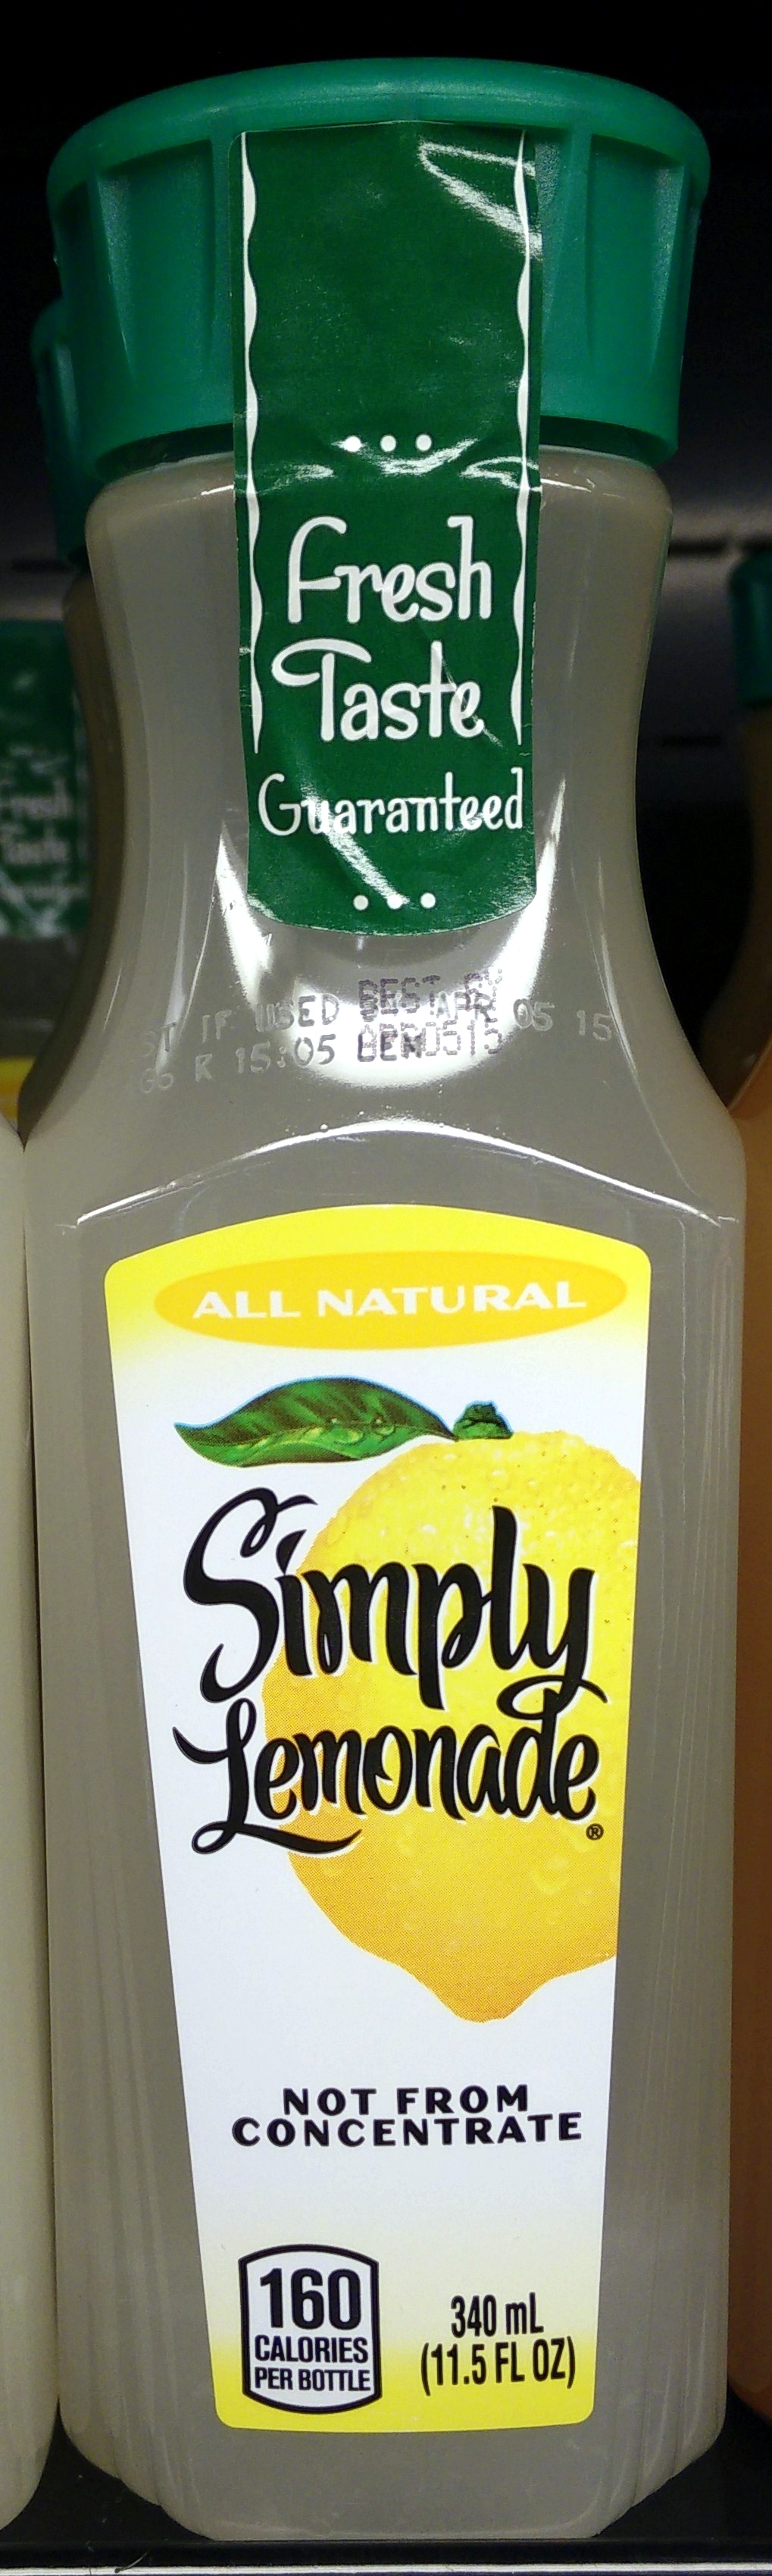 Simply Lemonade - Product